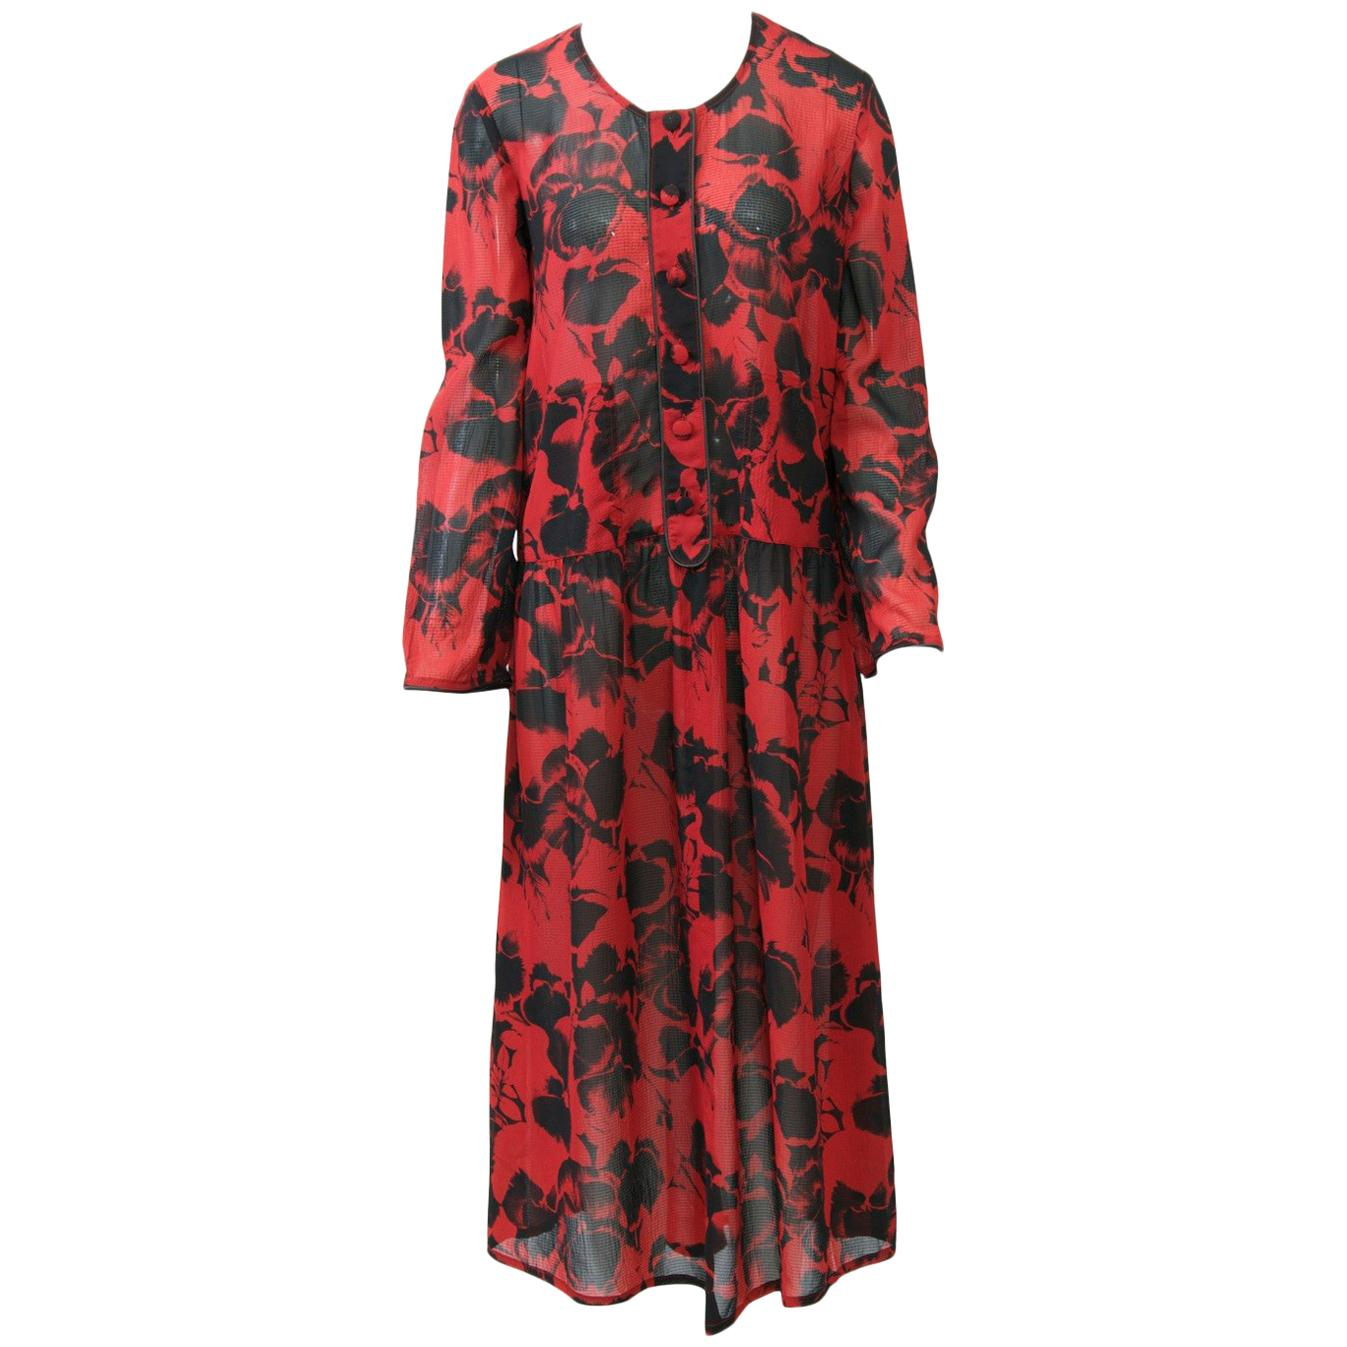 Sonia Rykiel Red Print Dress